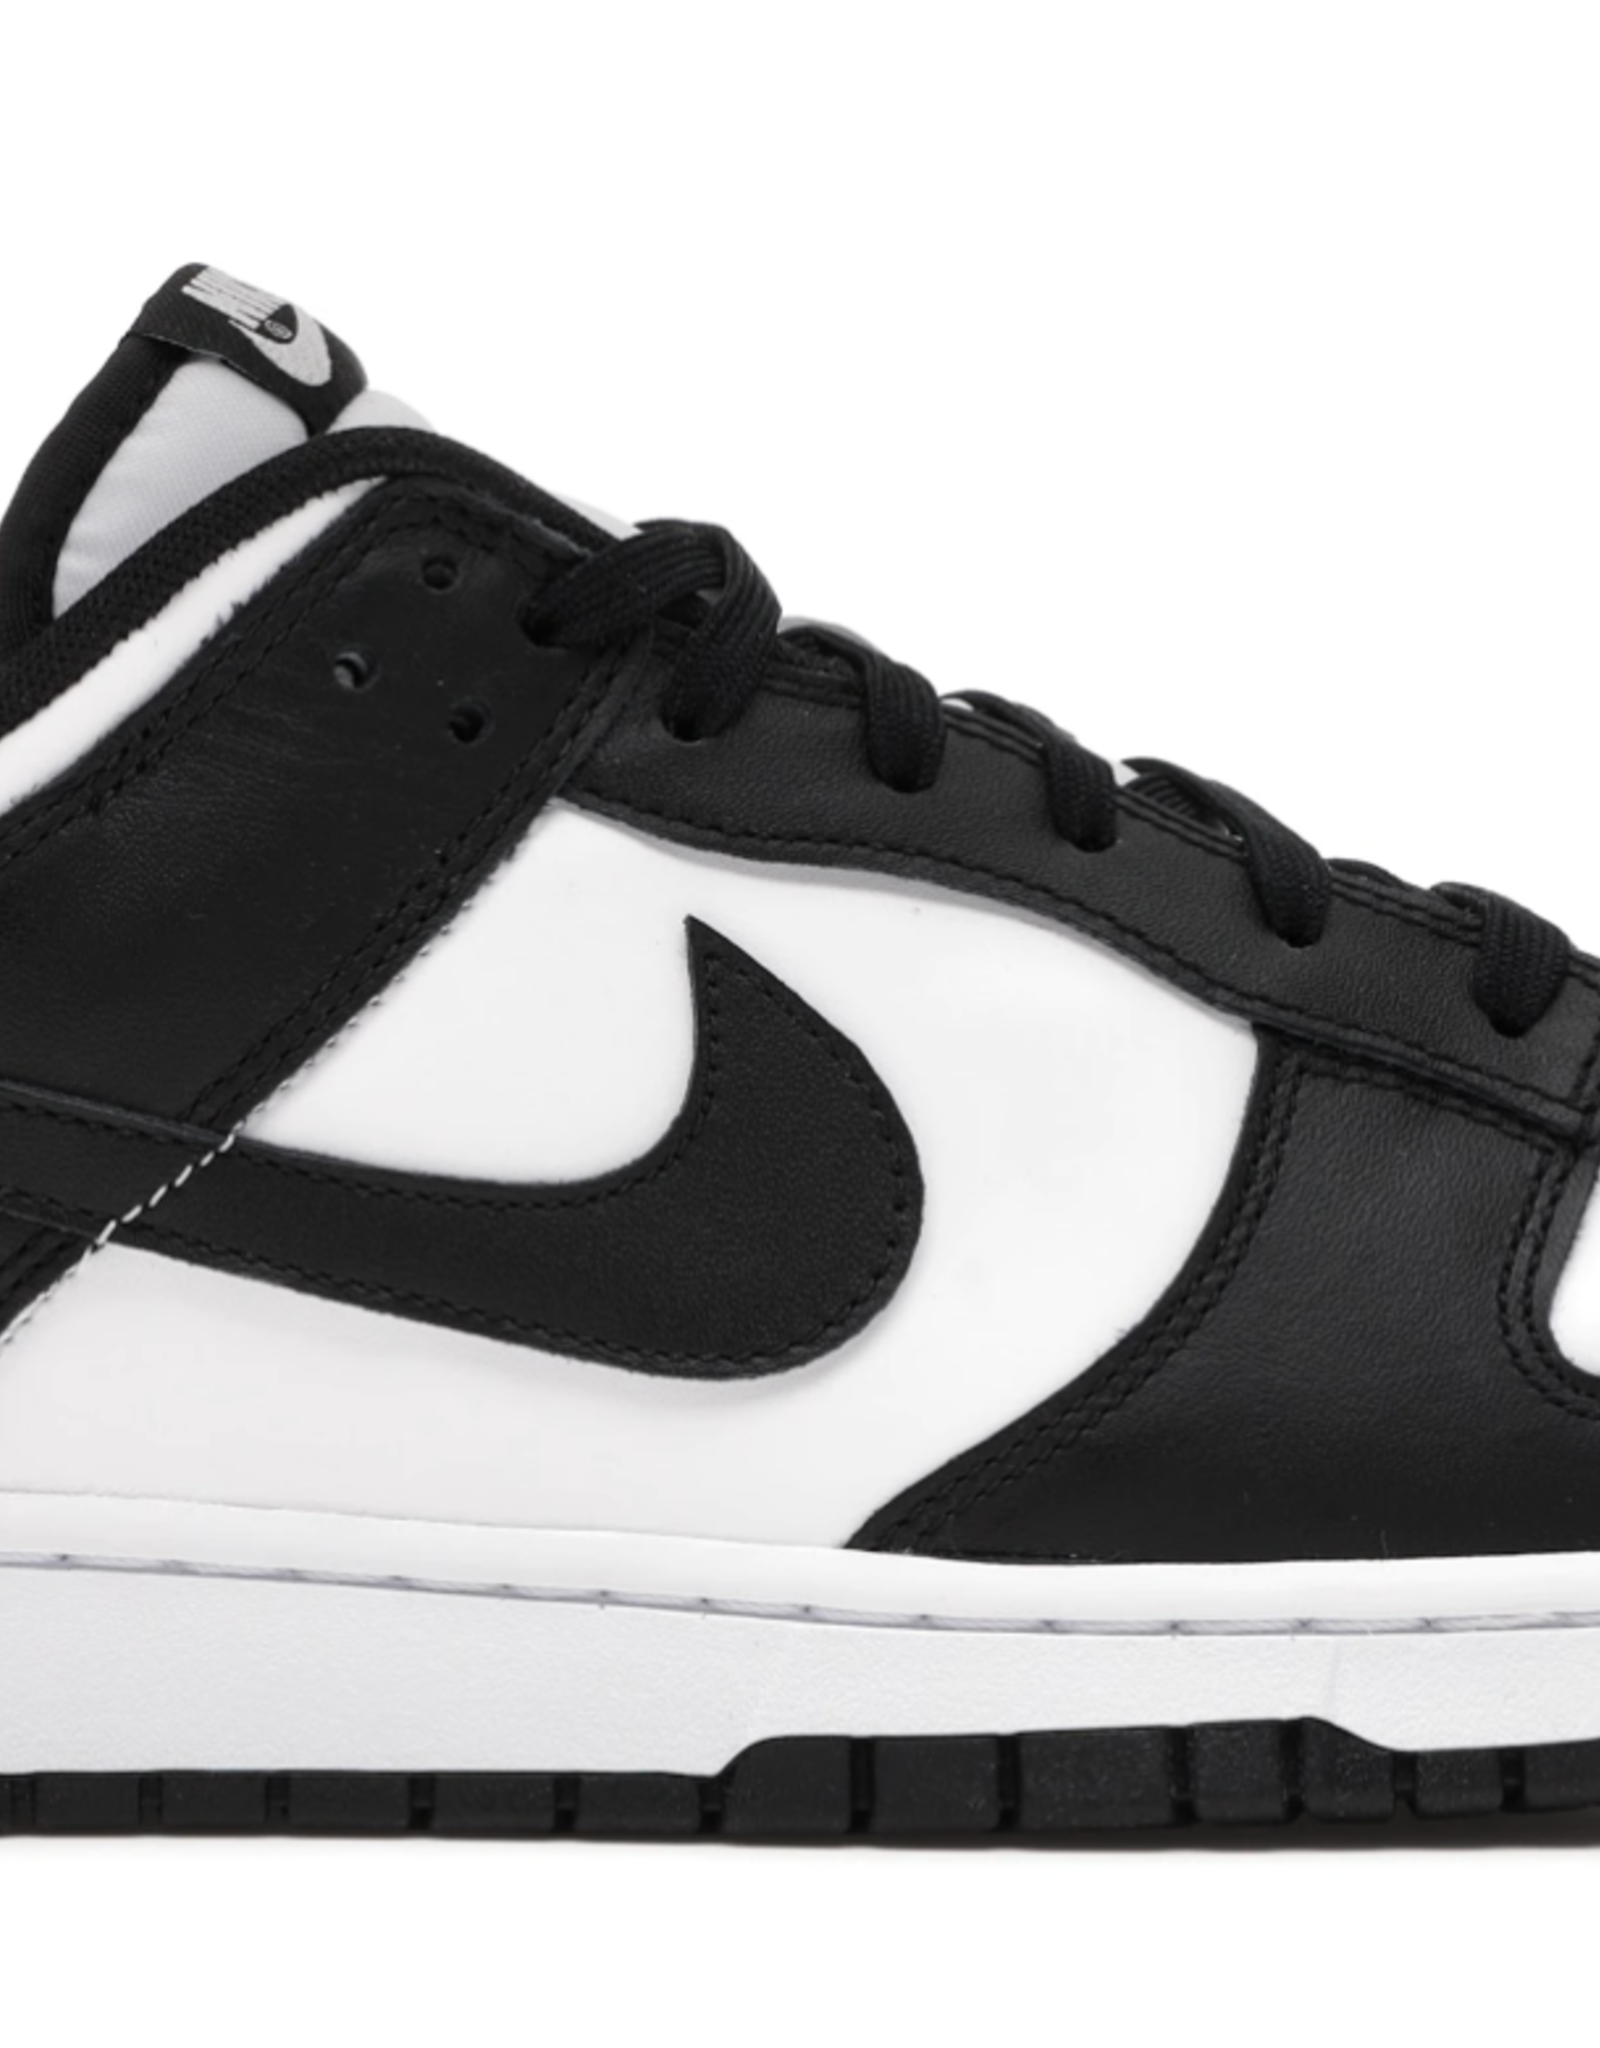 NIKE Nike Dunk Low Retro White Black (2021)